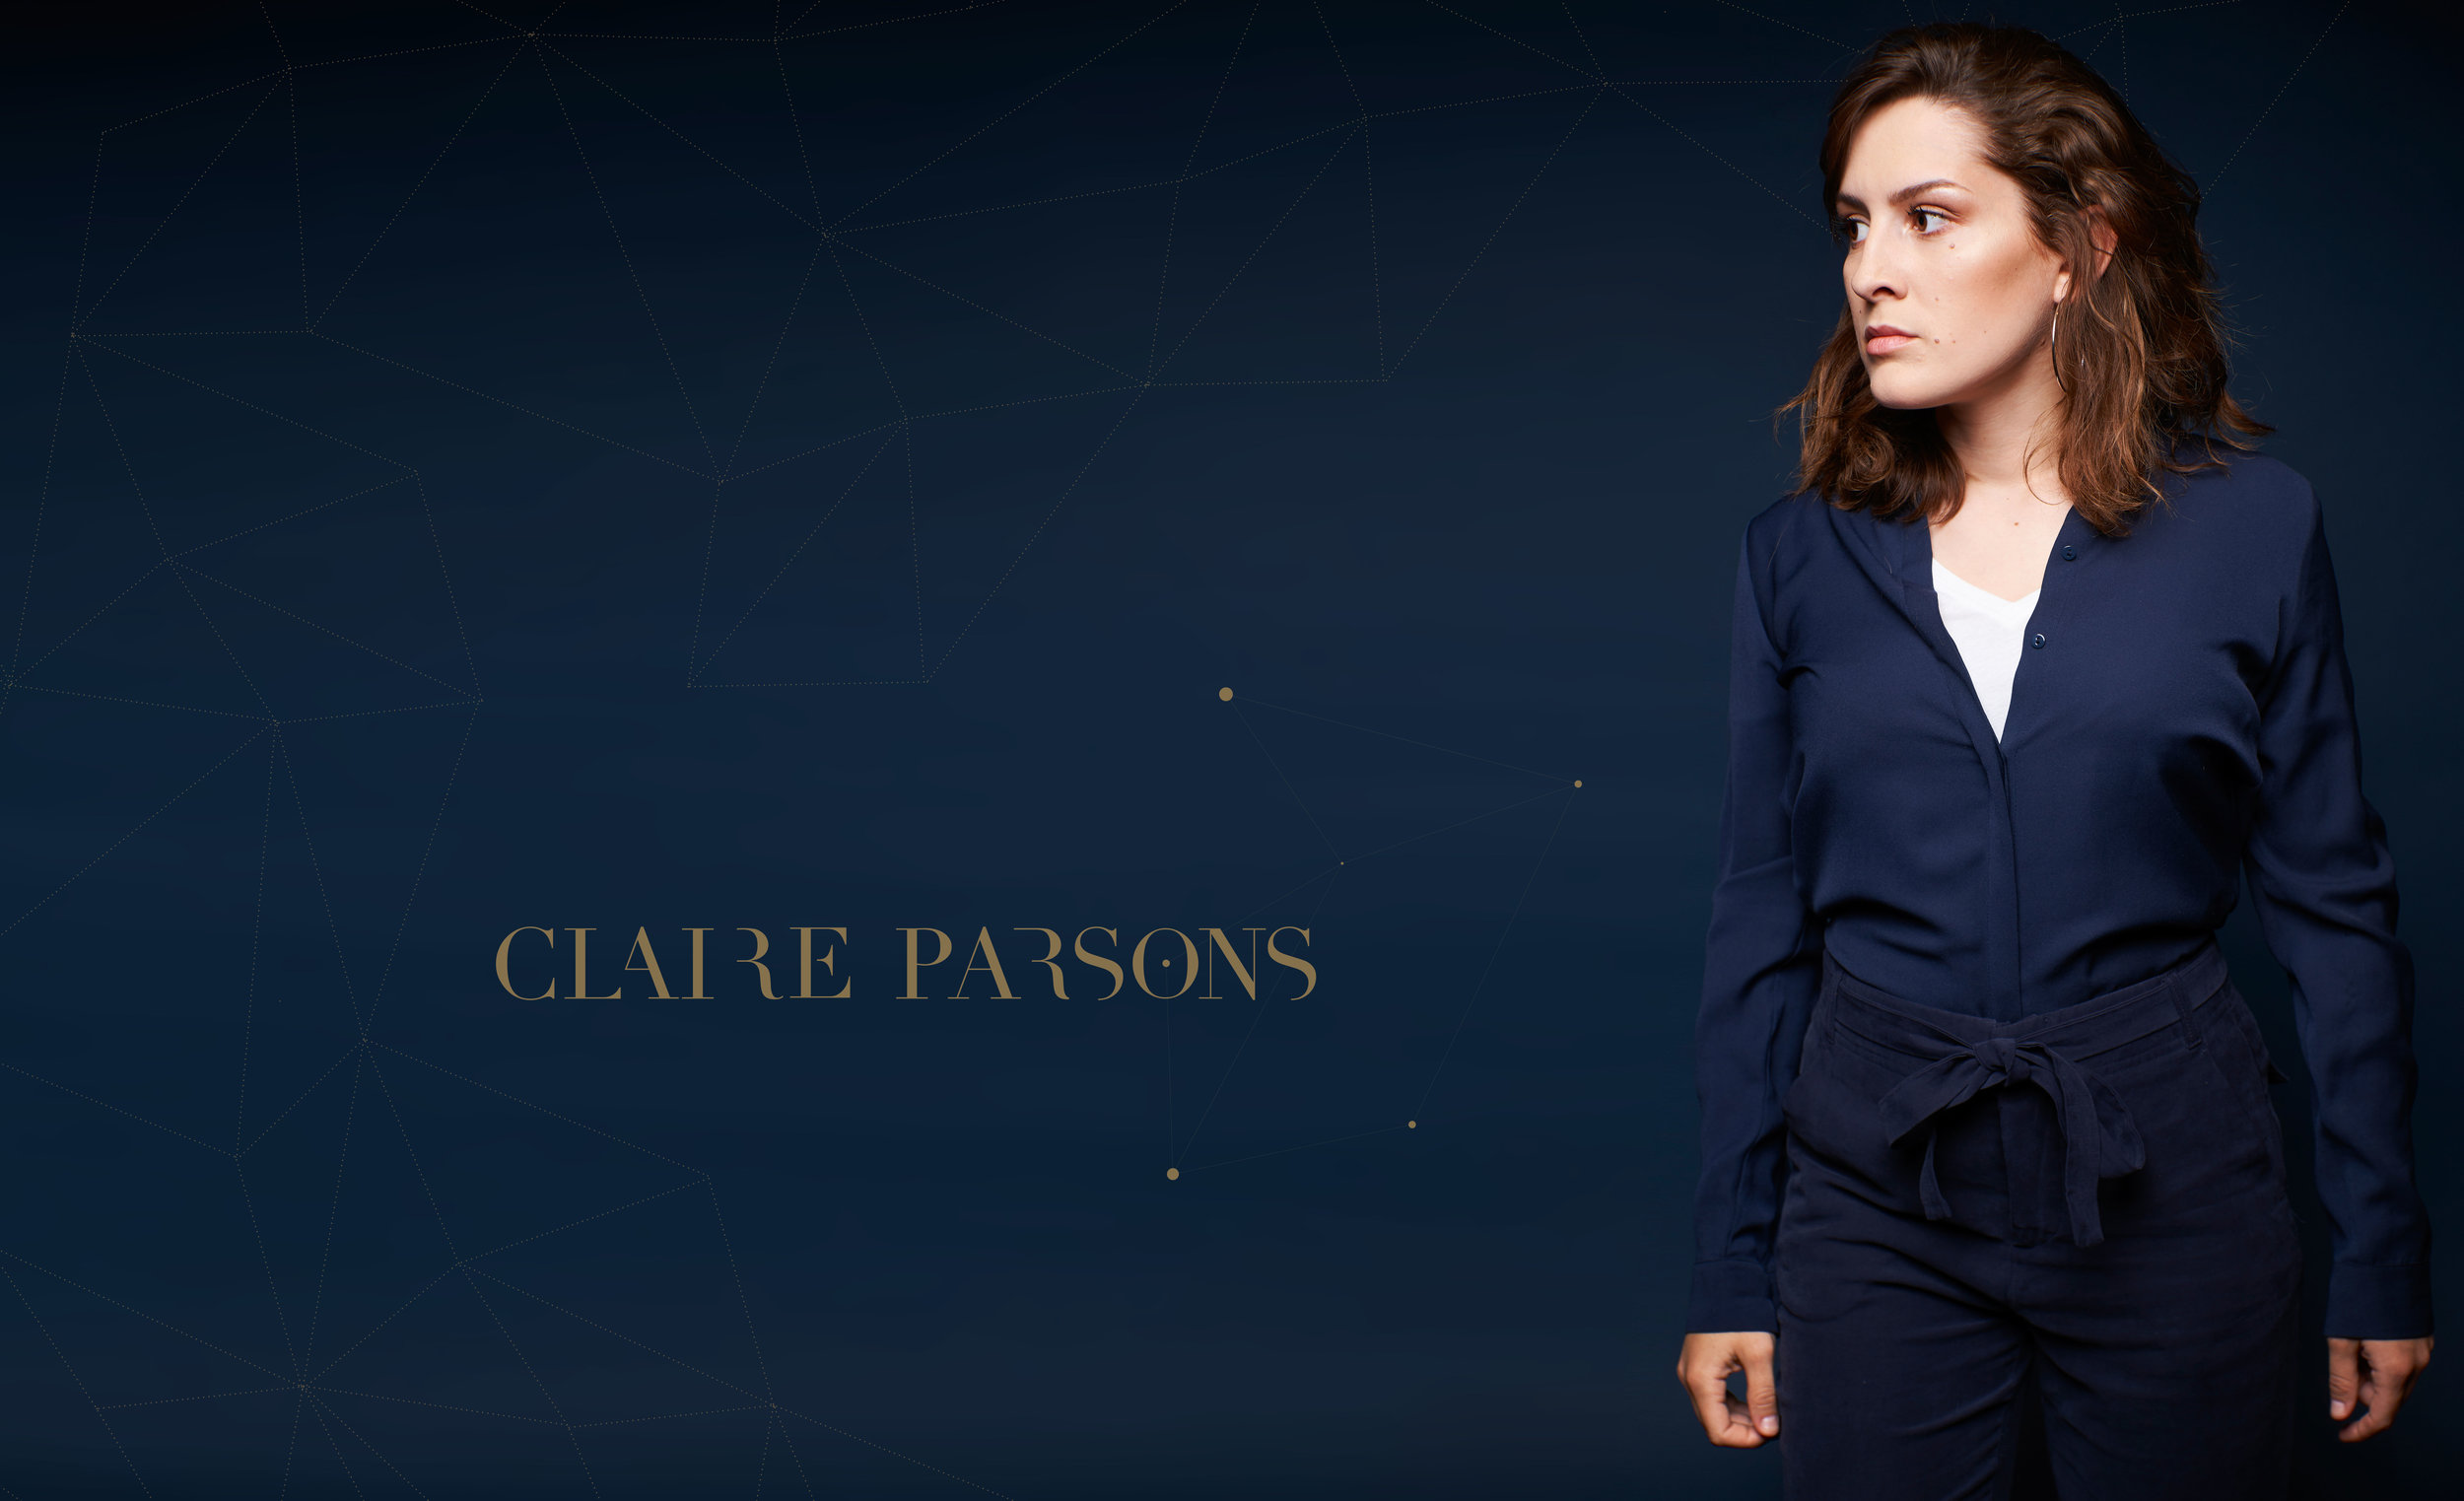 Claire-Parsons-2018-04-16-2305.jpg